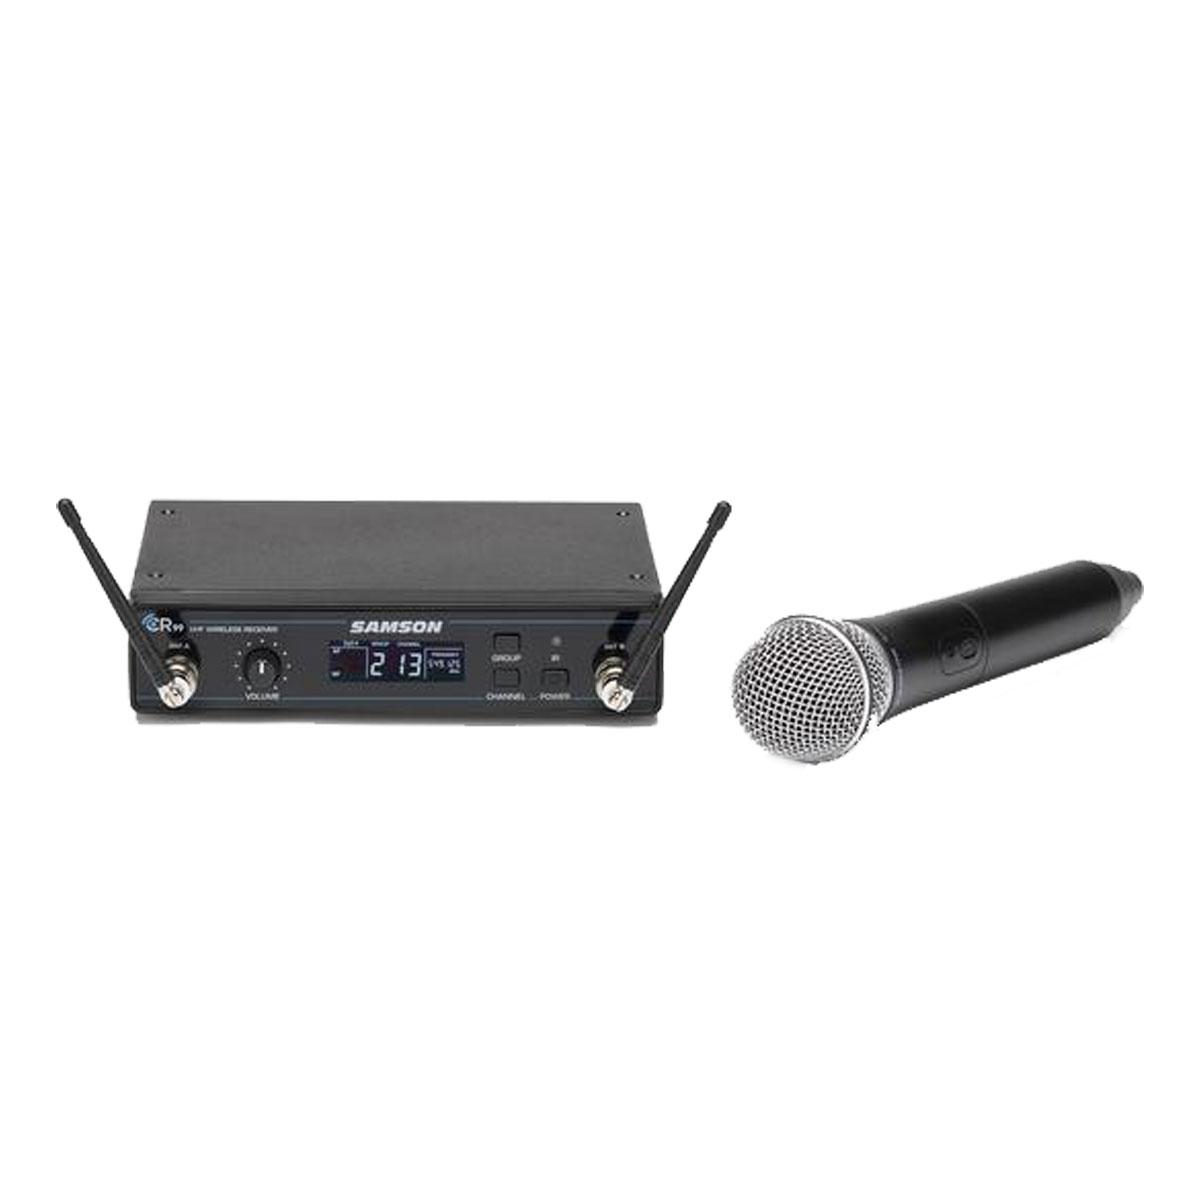 Samson Concert 99 UHF Wireless Microphone